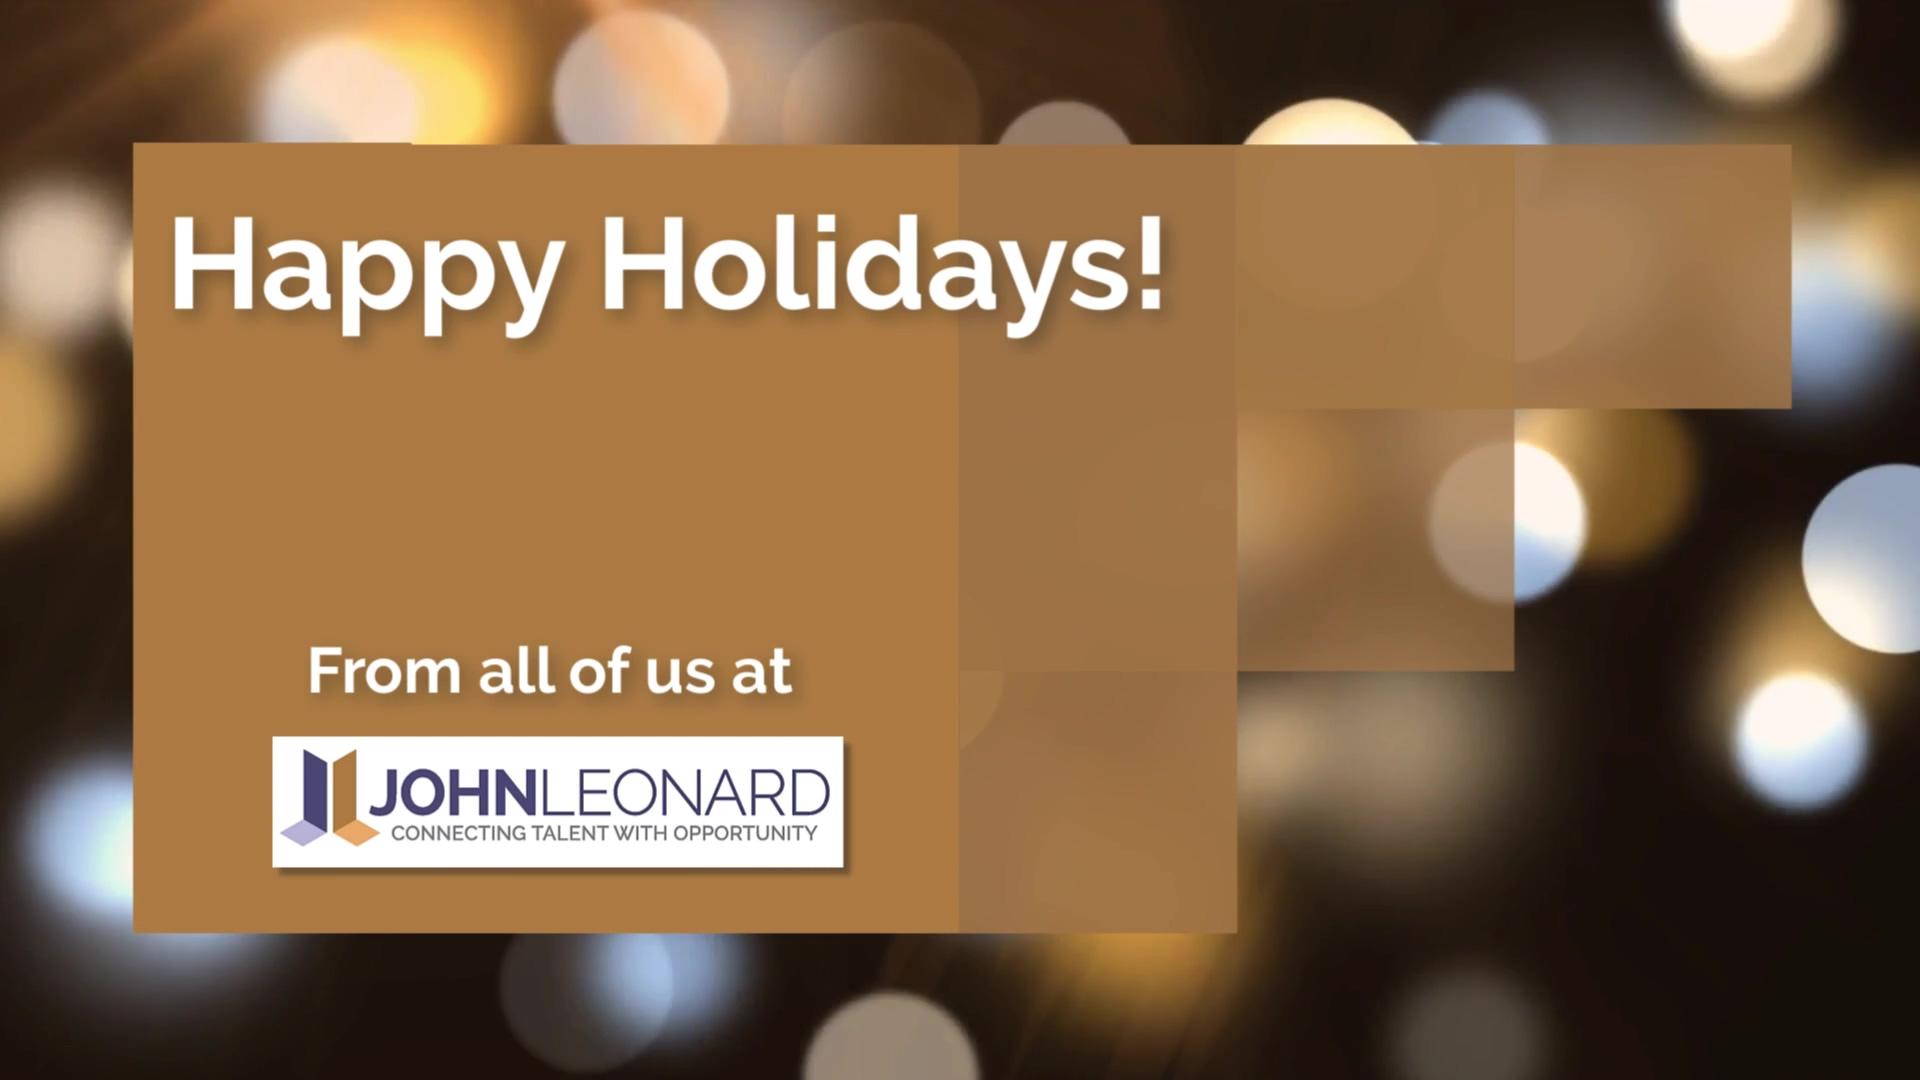 JL Happy Holidays Video